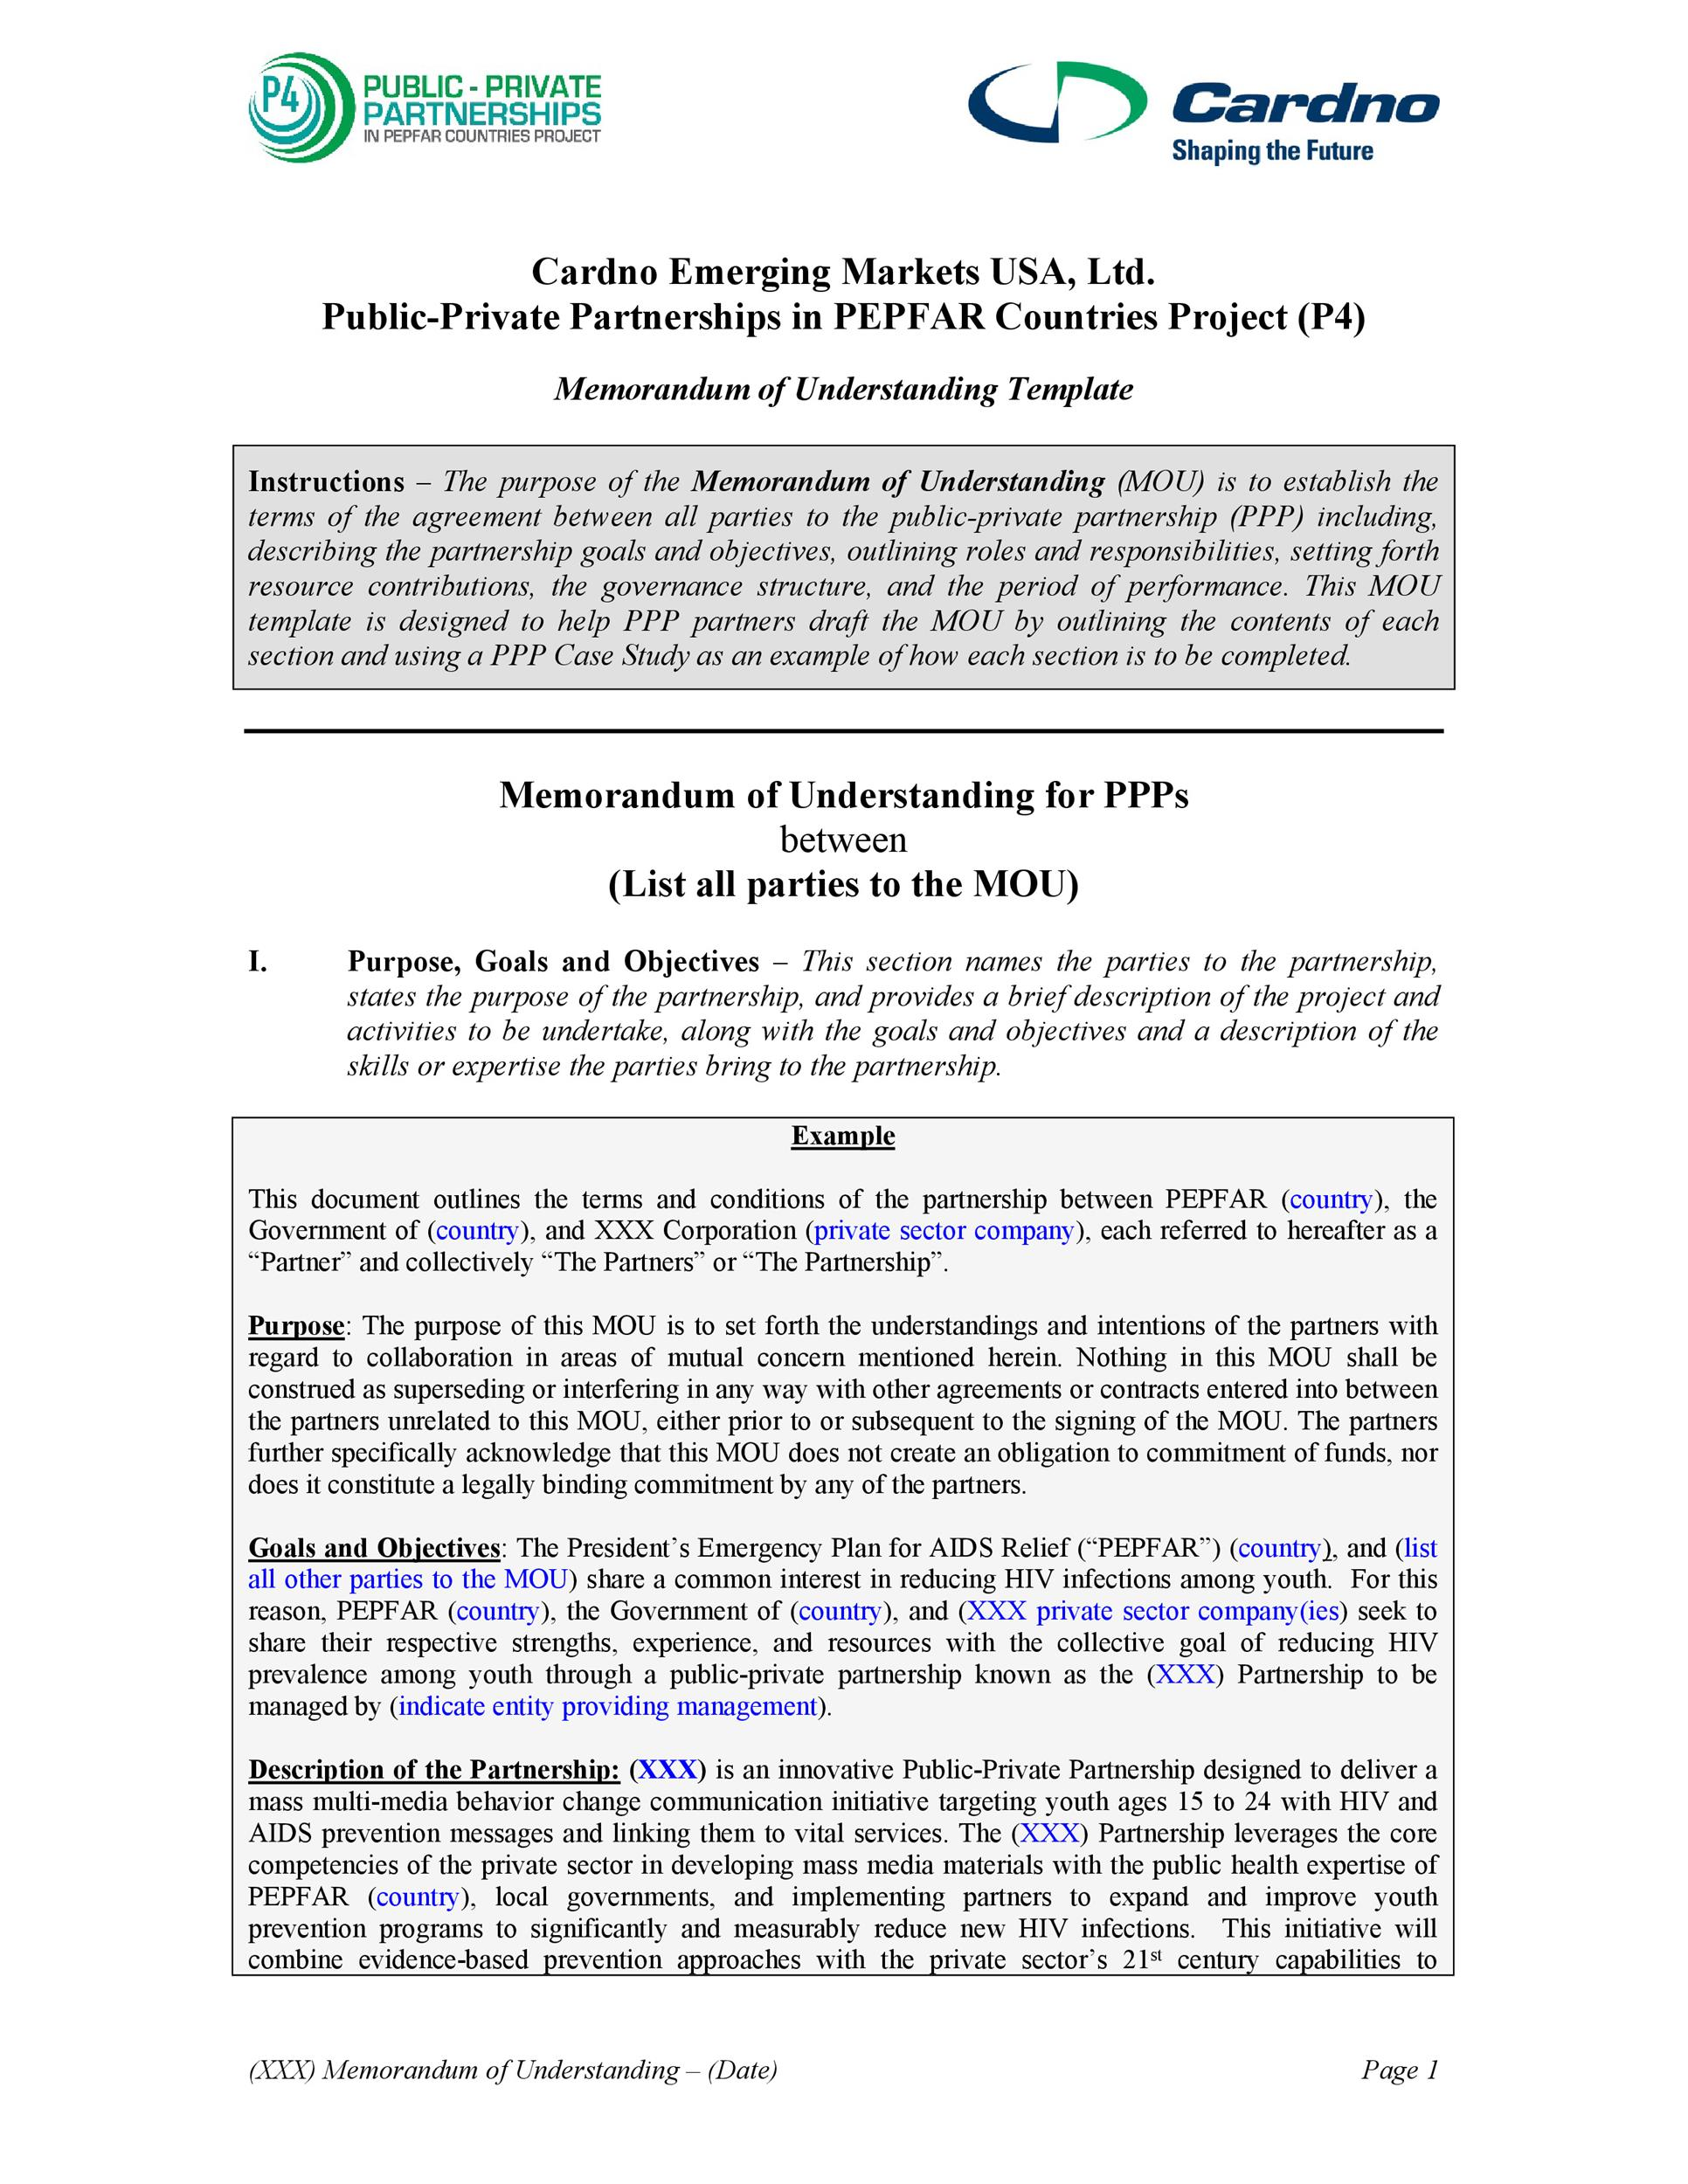 Free Memorandum of Understanding Template 18